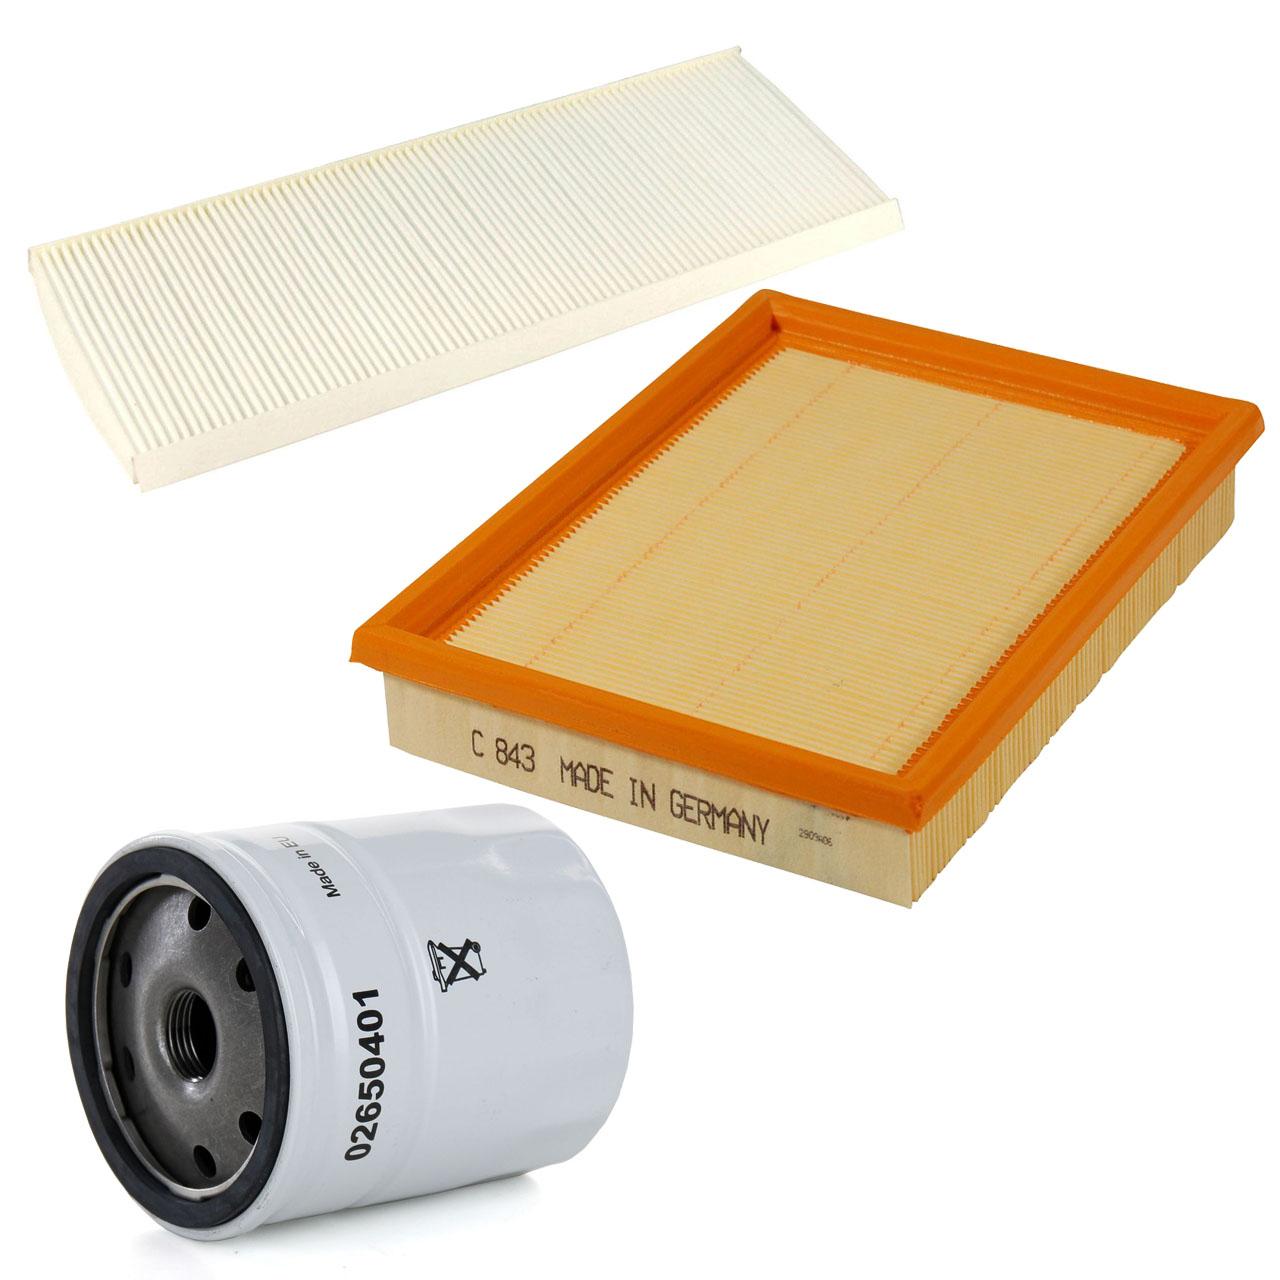 Inspektionskit Filterpaket Filterset für Opel Combo Corsa B Tigra A 1.2 1.4 1.6